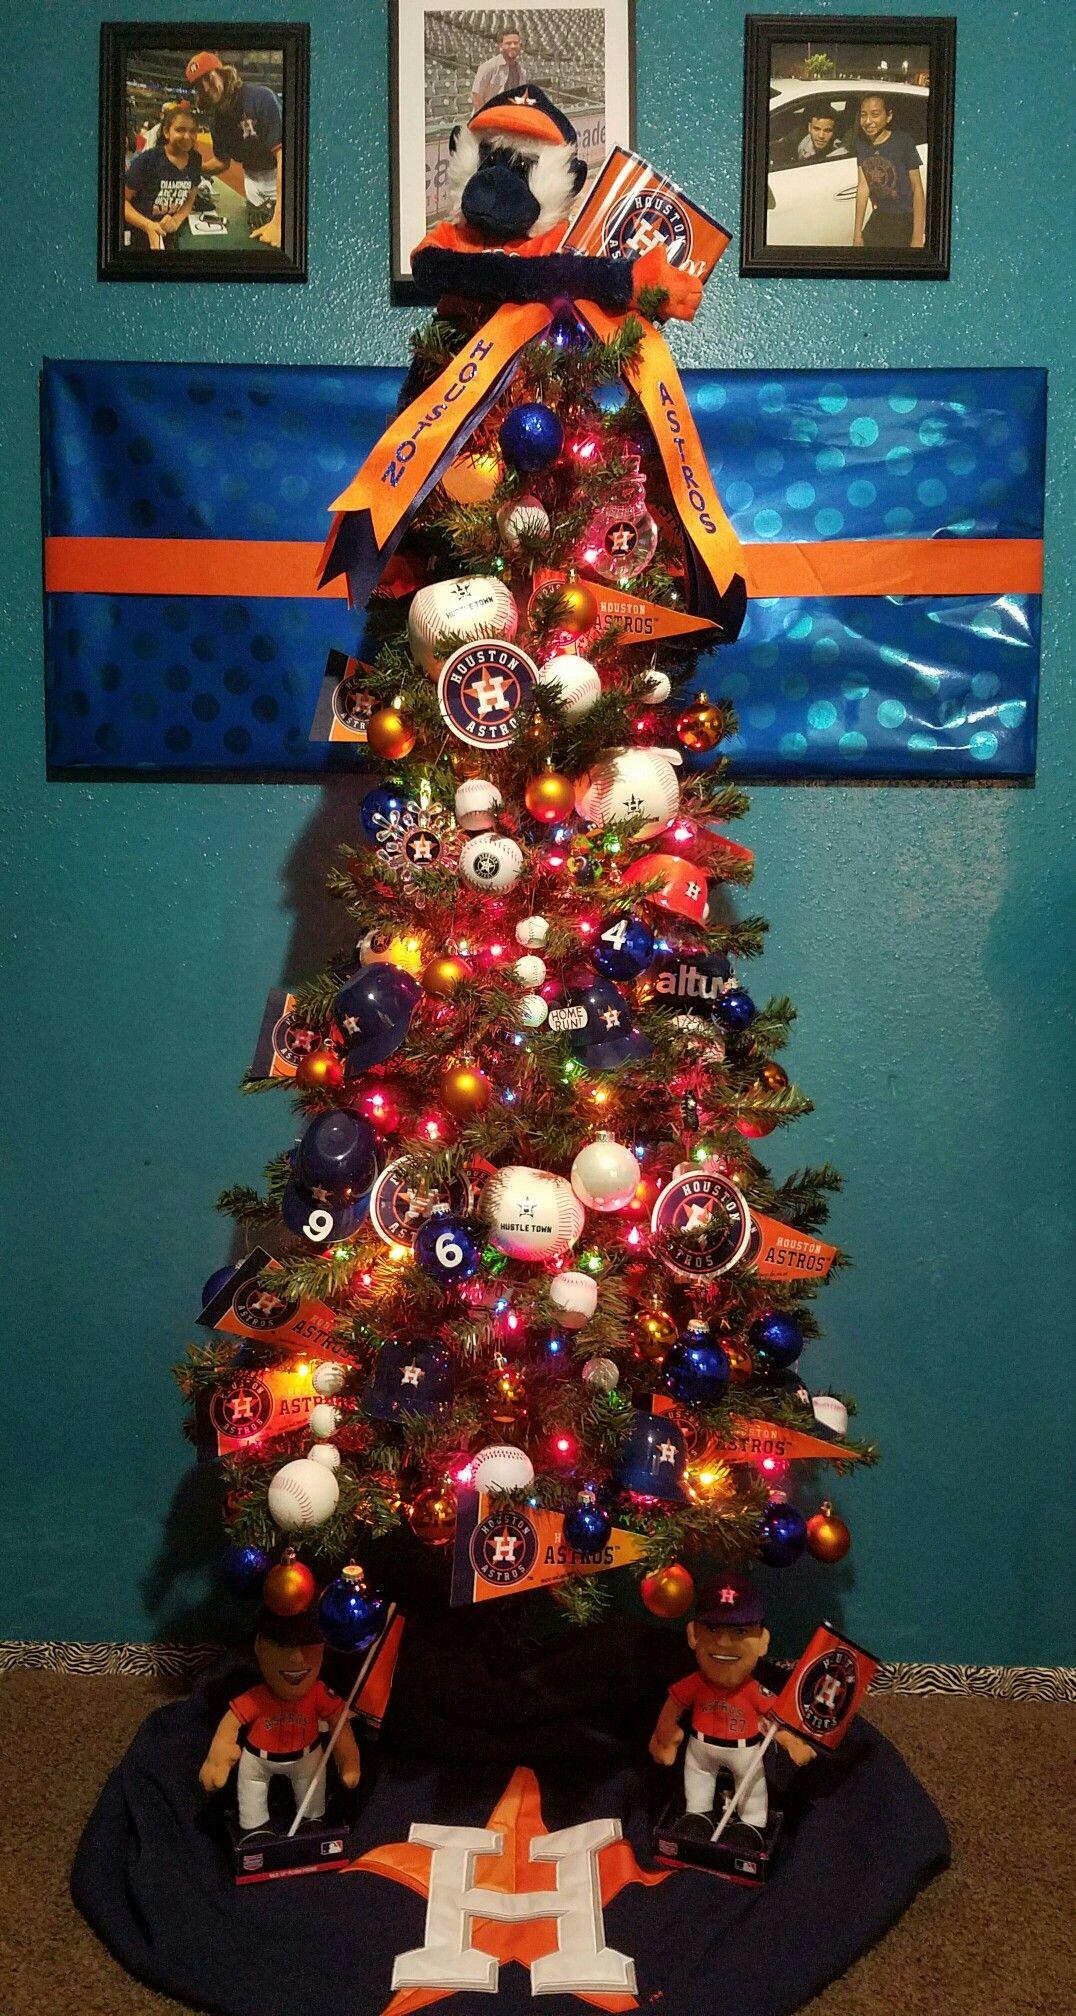 christmas treehouston astros christmas tree themed christmas trees unique christmas trees xmas